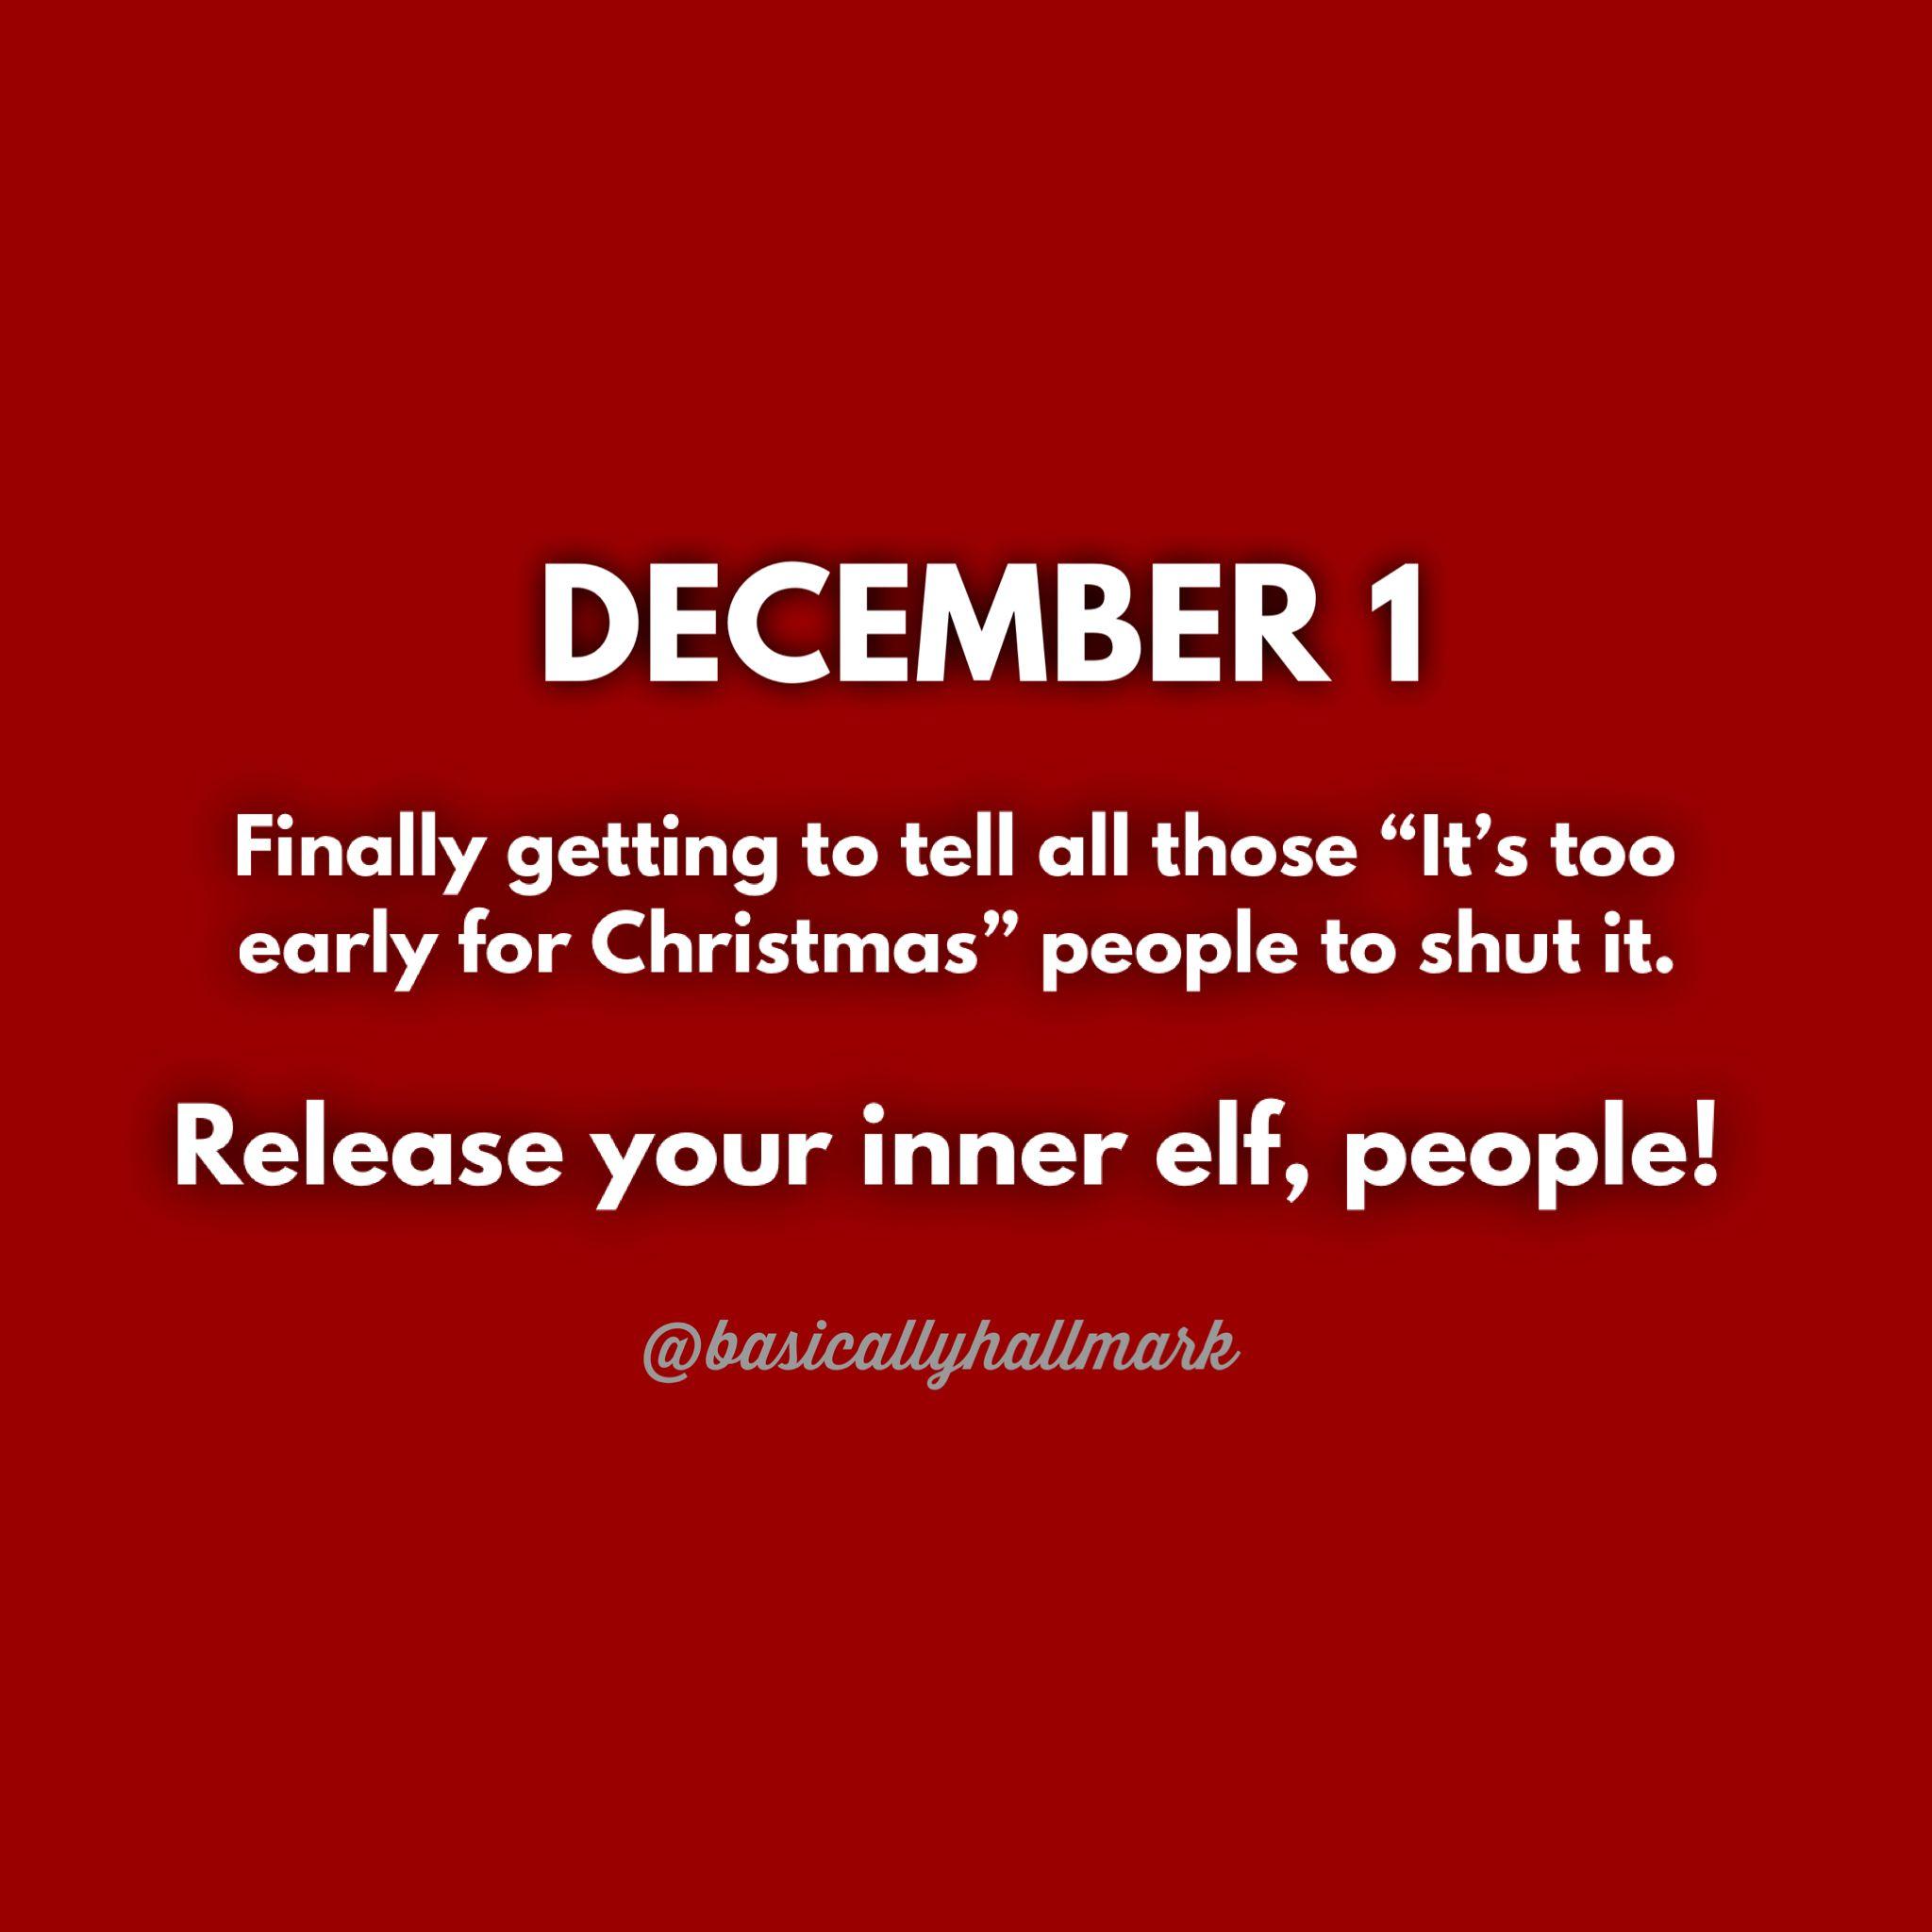 December 1st Meme Funny Quotes For Kids Christmas Movie Quotes Christmas Quotes Funny